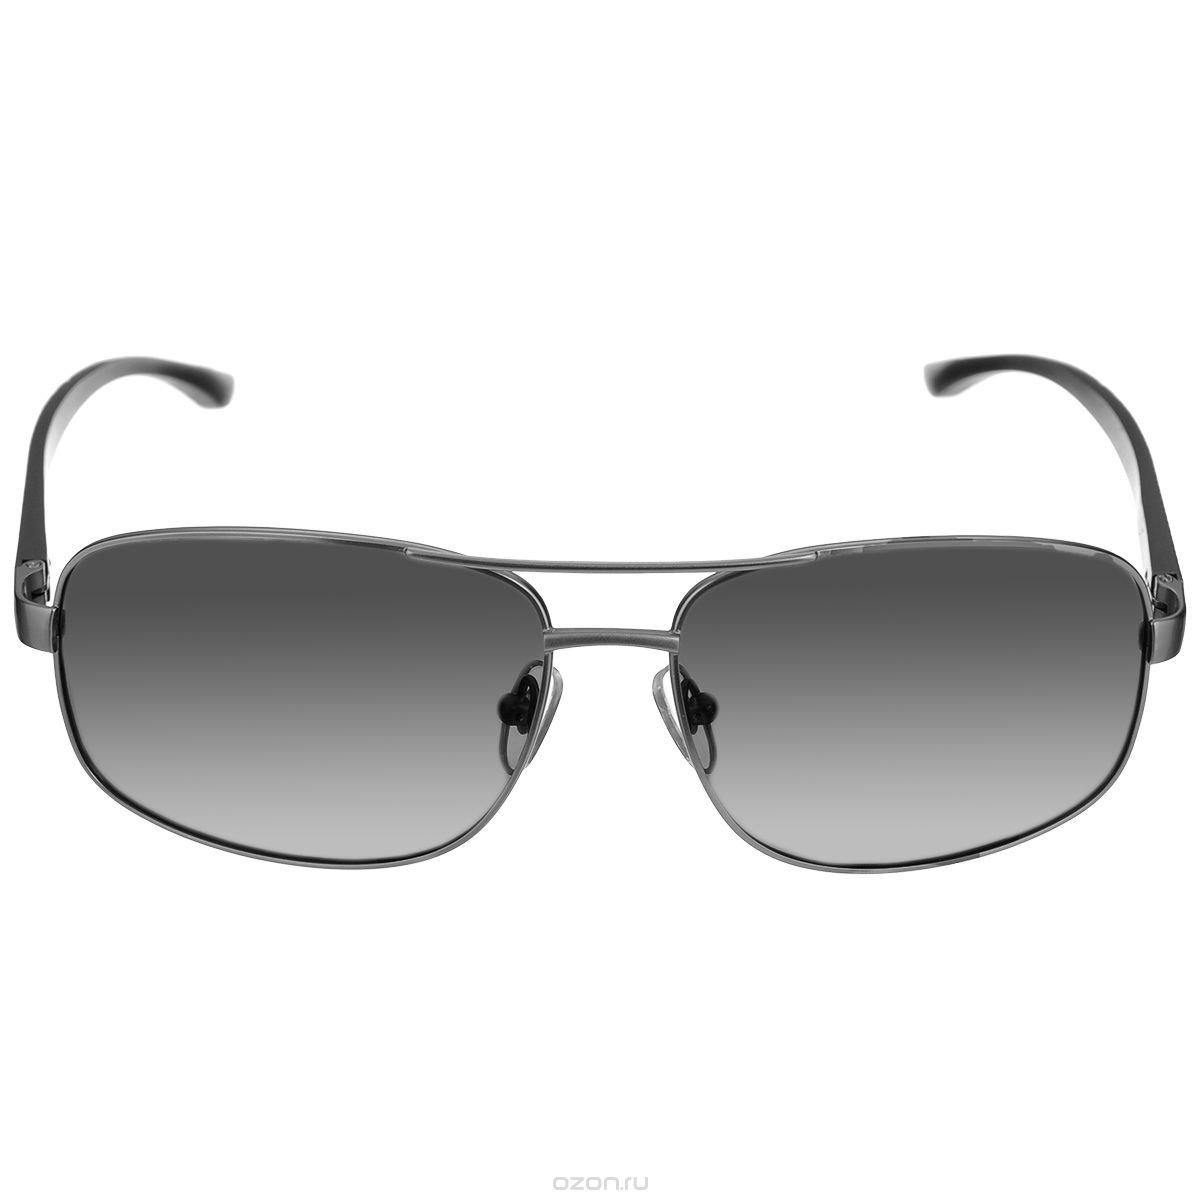 1fe4e2b12835 Очки мужские, поляризационные Cafa France, цвет  серый. CF8529